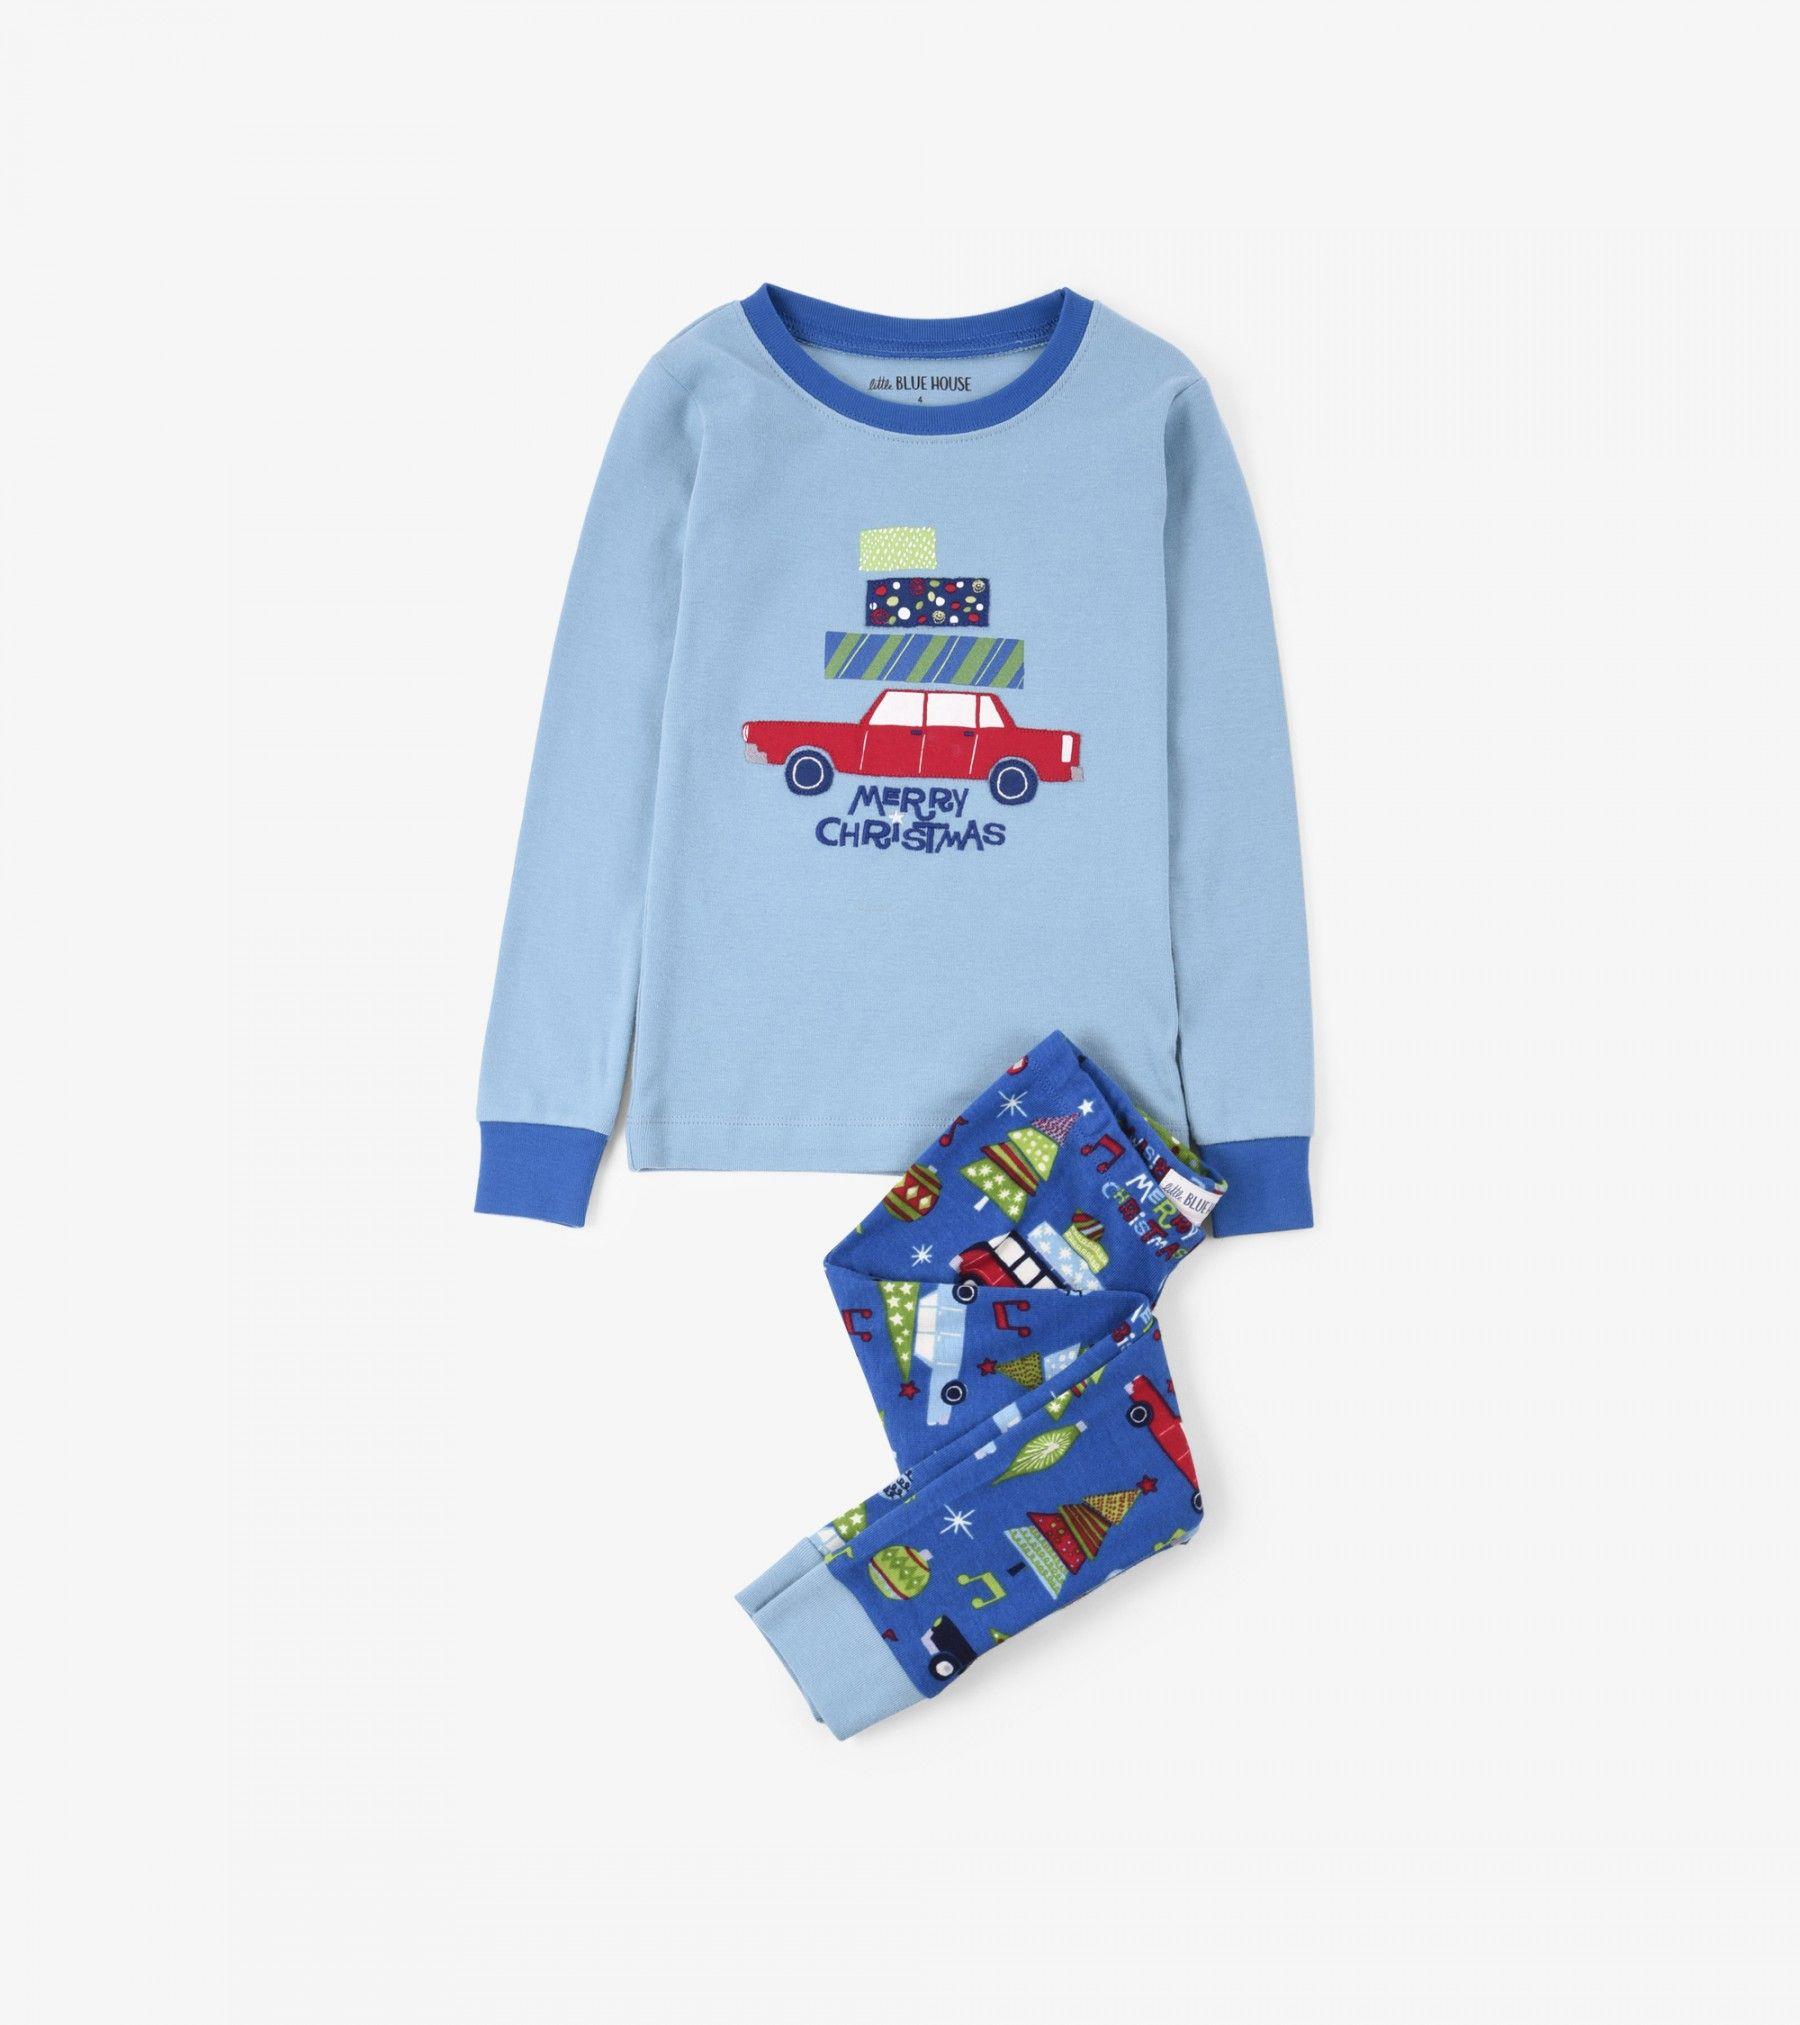 Retro Festive Blue Kids' Pajama Set Little Blue House by